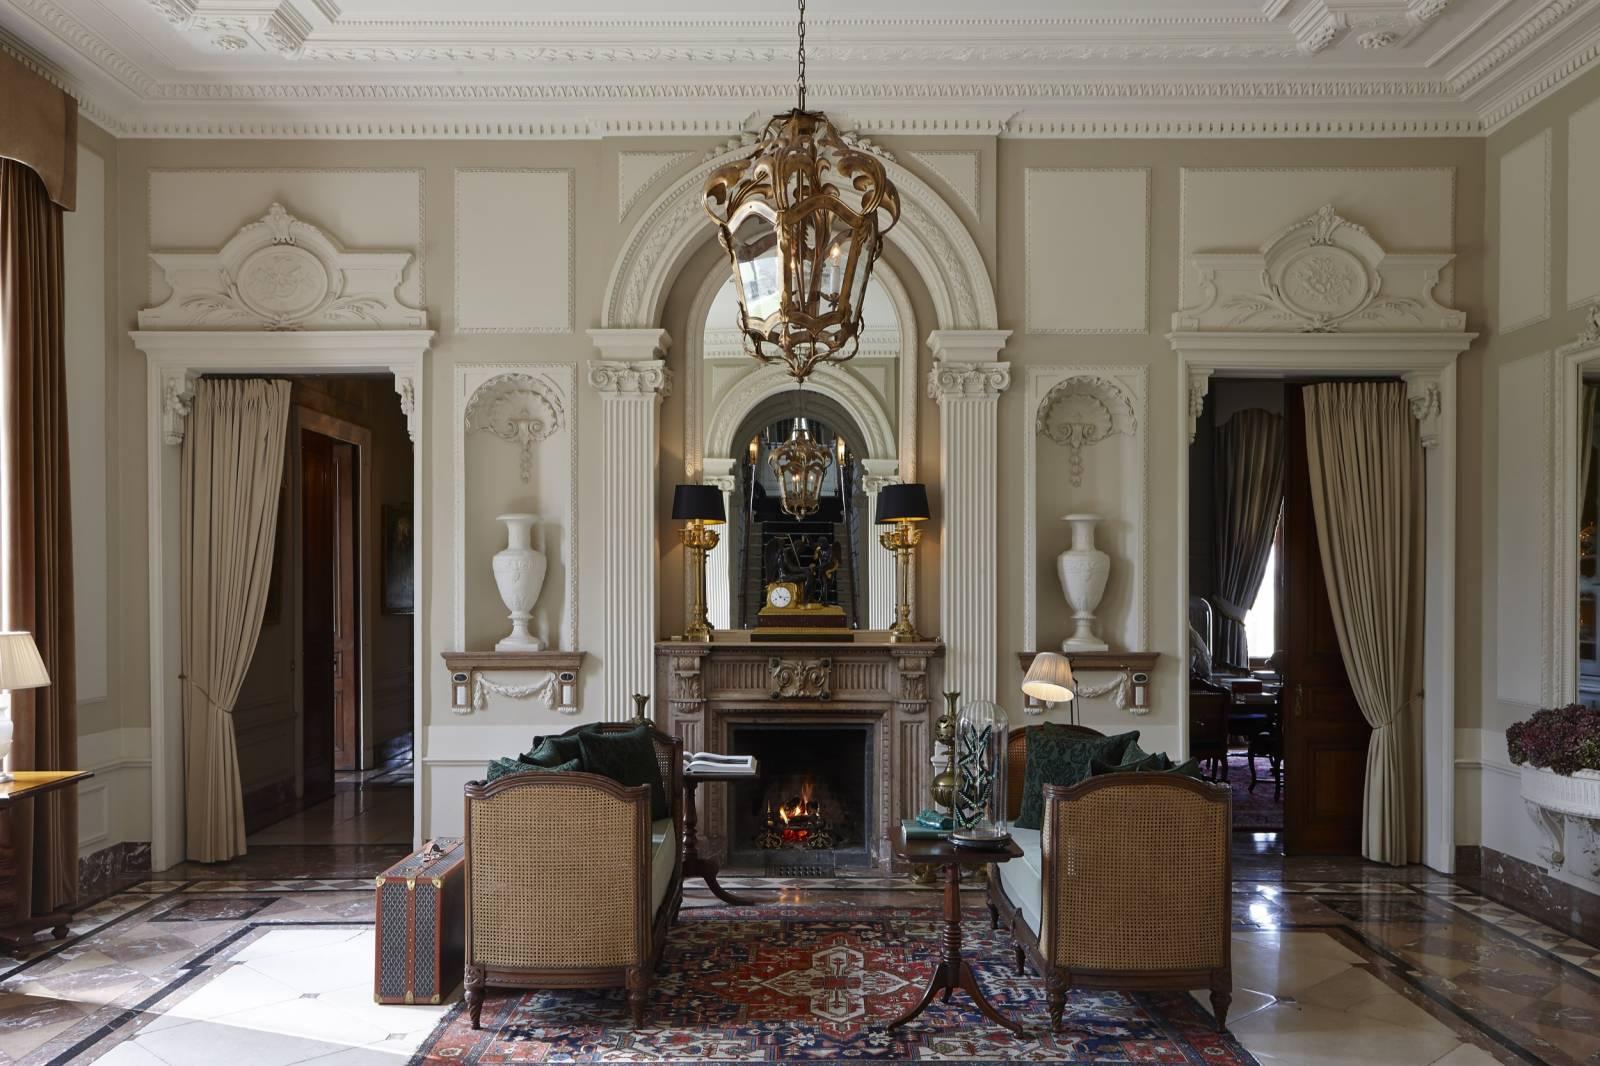 Chateau de Spycker - House of Weddings-03